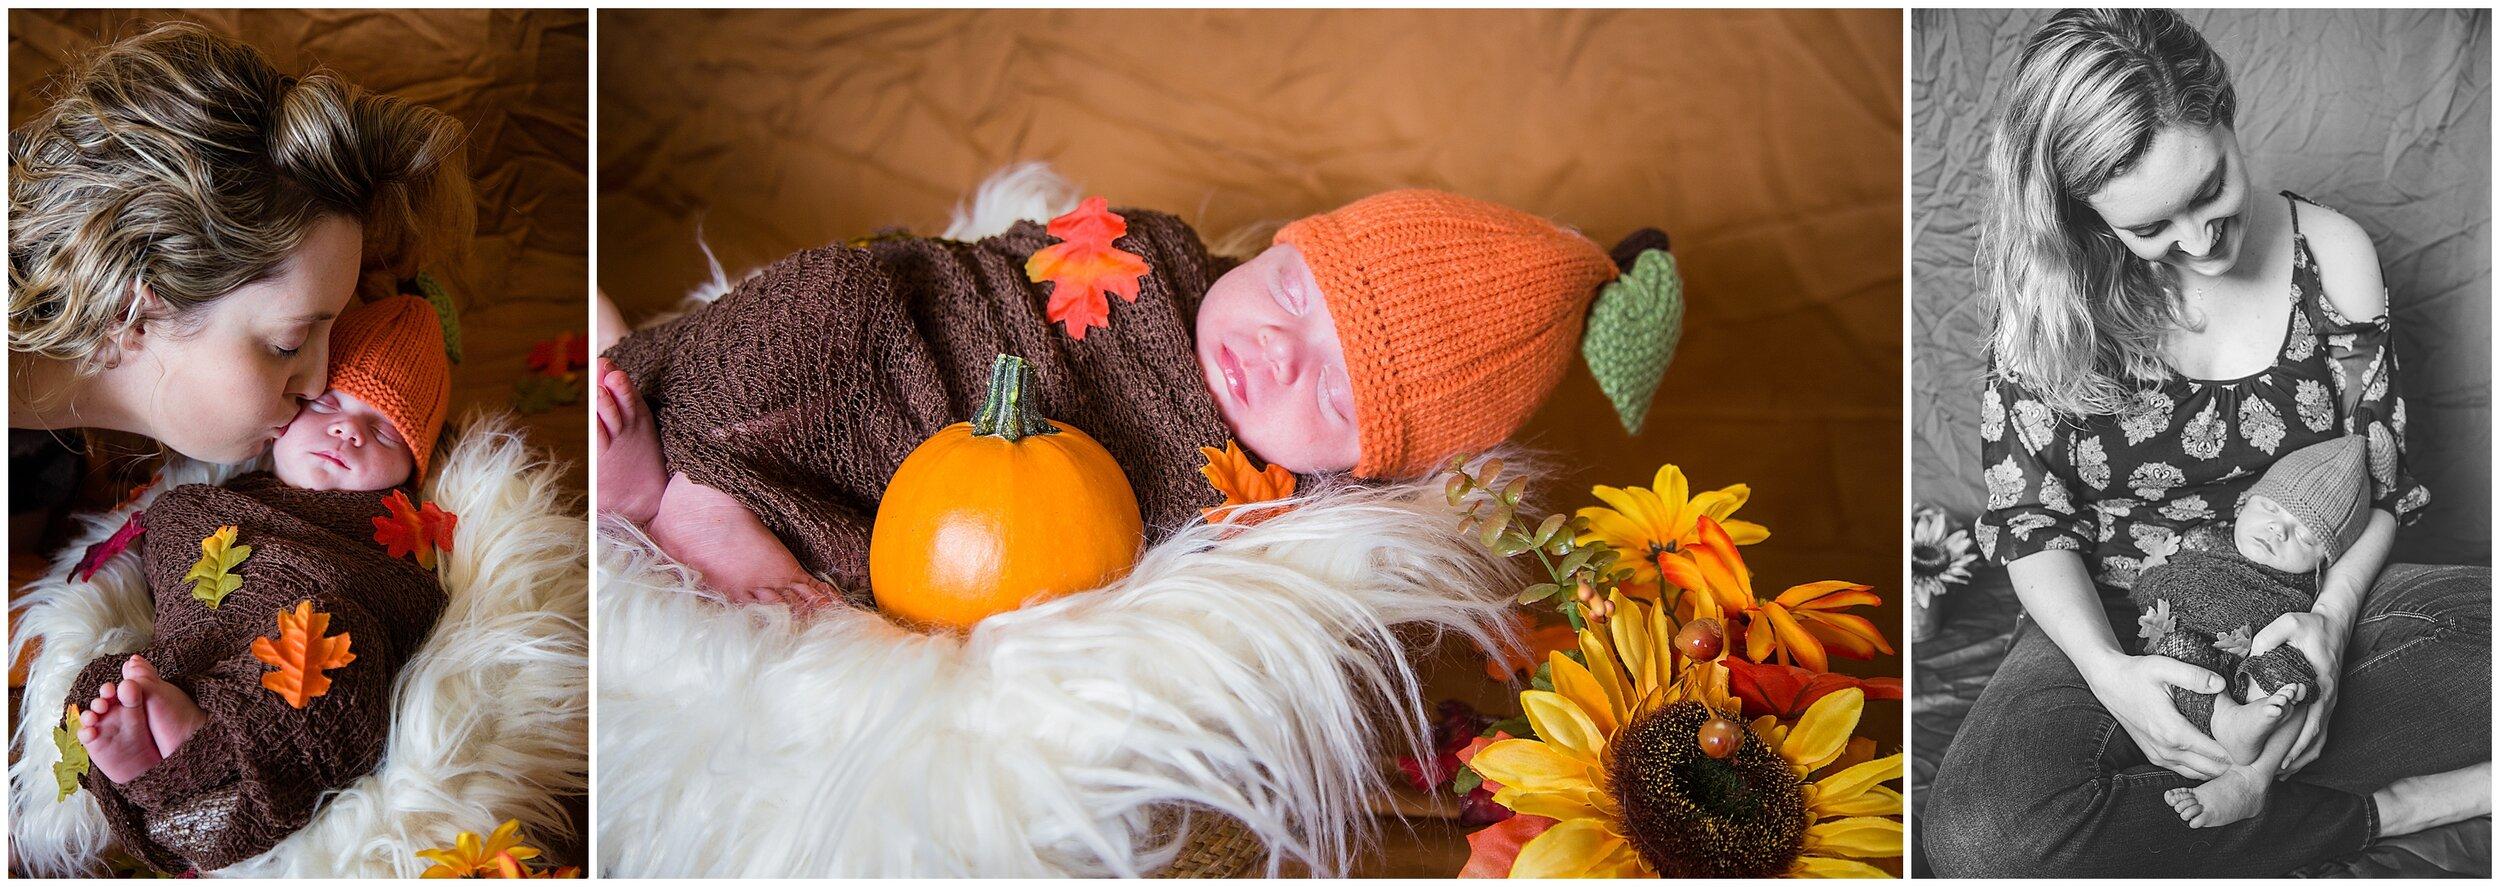 baby leiff newborn photography_0011.jpg